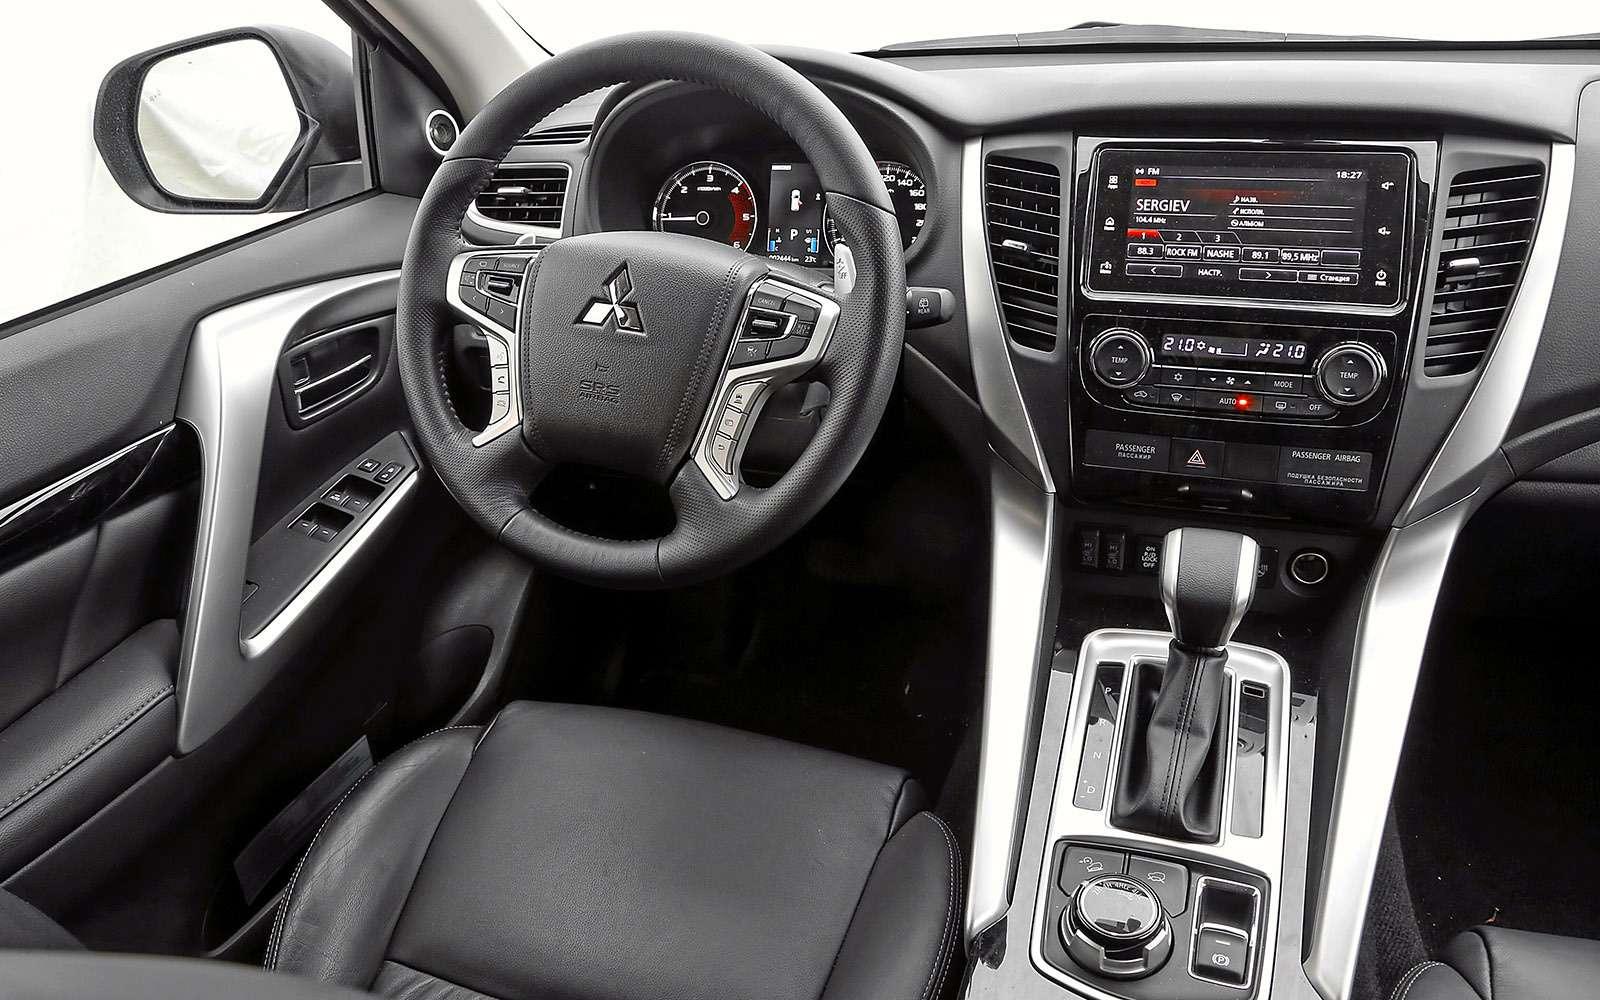 Mitsubishi Pajero Sport иKia Mohave— сравнительный тест настоящих внедорожников— фото 769868